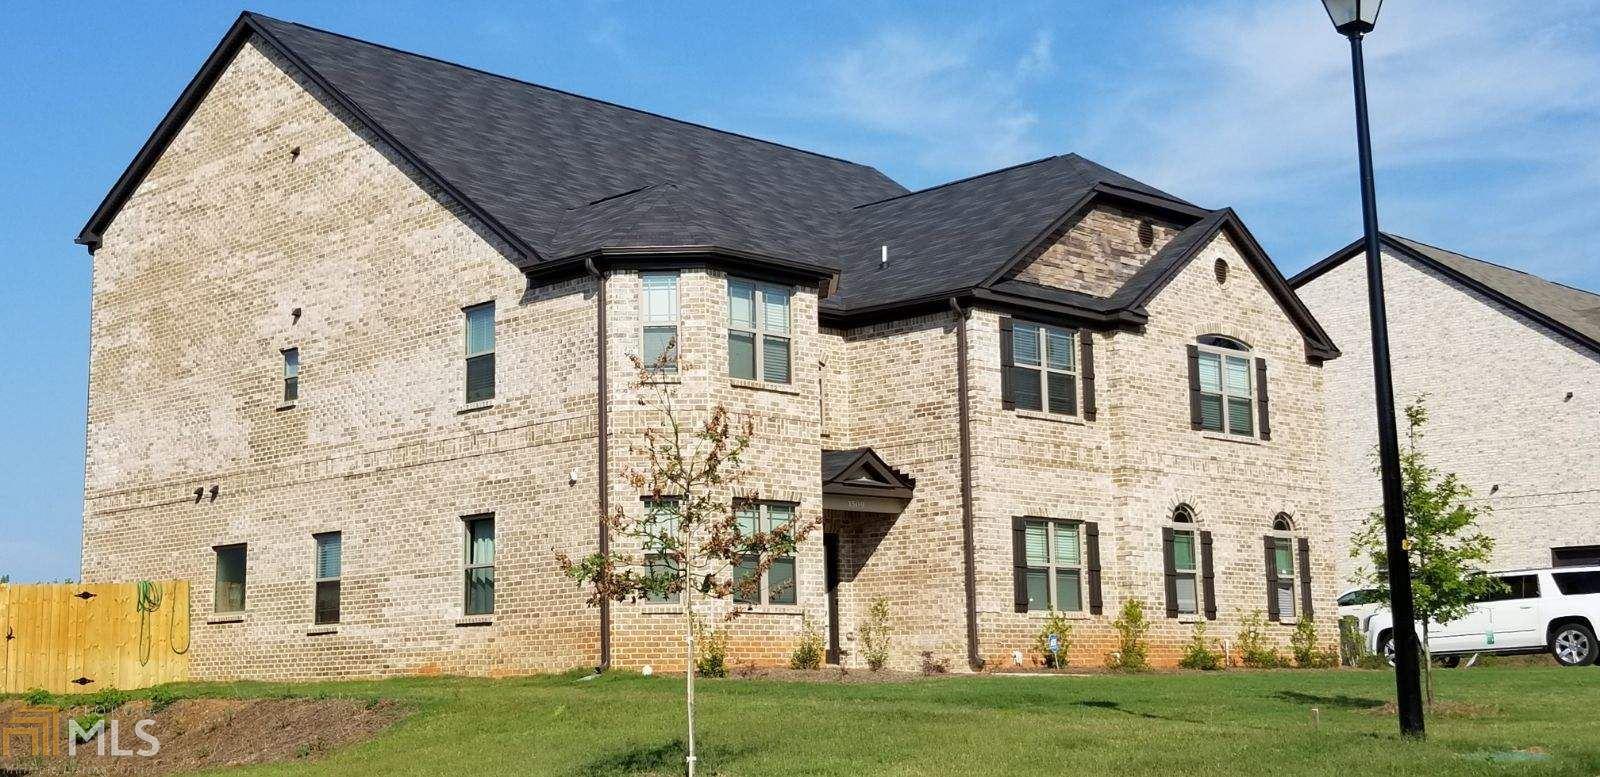 1509 Harlequin Stockbridge, GA